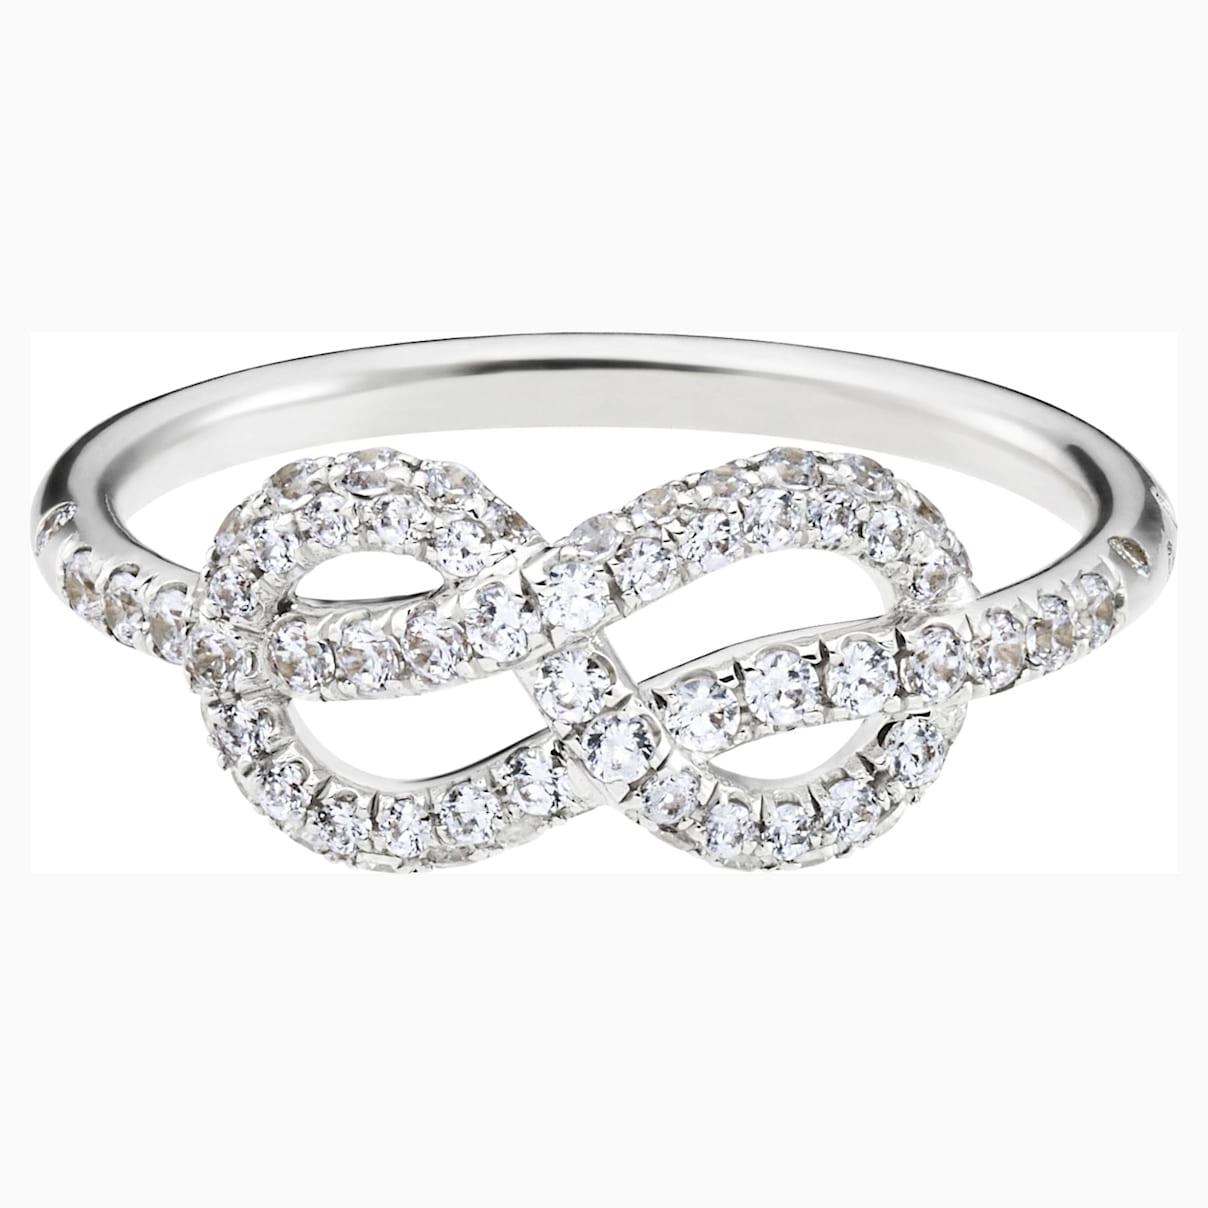 Knot of True Love Classic Pavé Ring, Swarovski Created Diamonds, 18K White Gold, Size 52